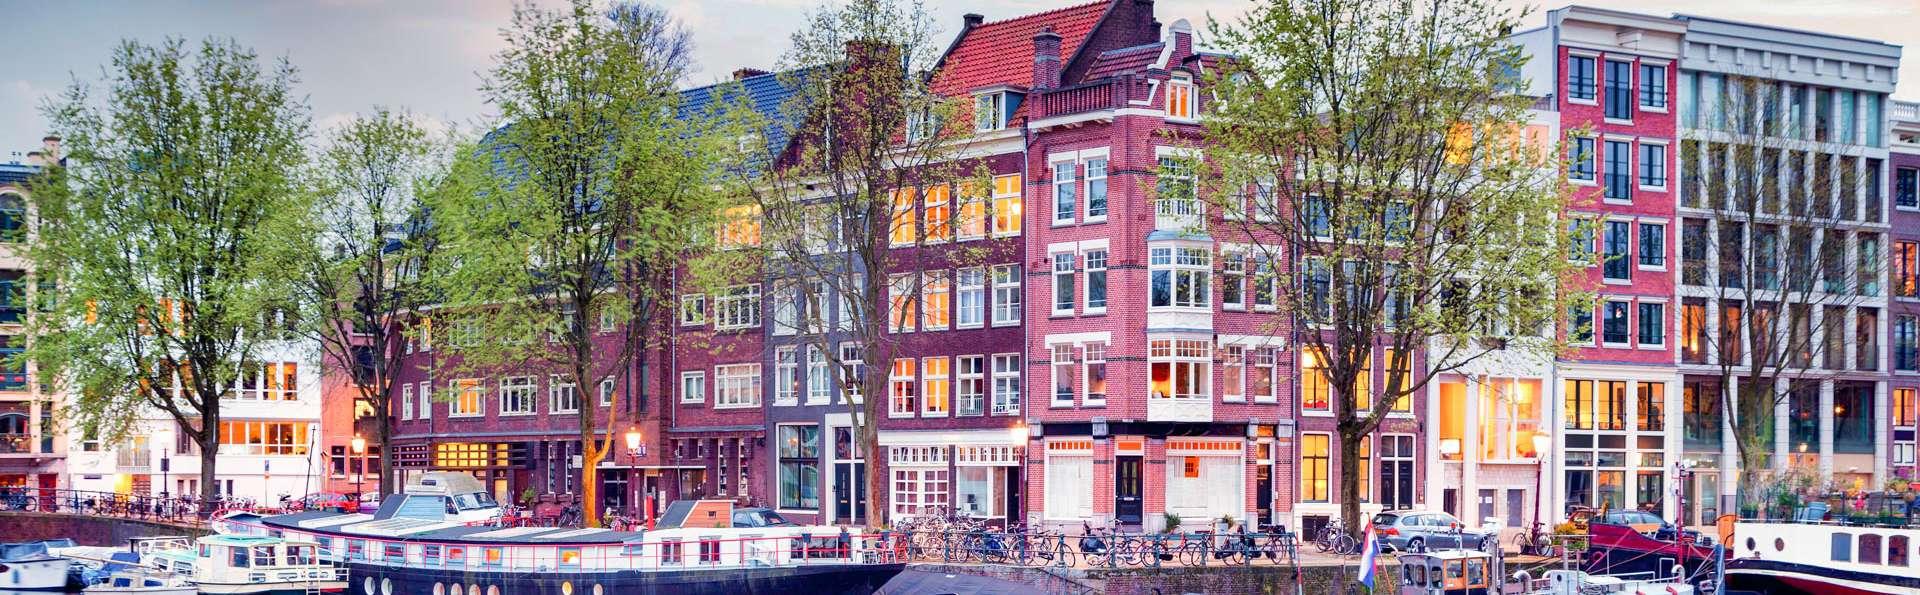 Zoku Amsterdam - EDIT_AMSTERDAM_13.jpg